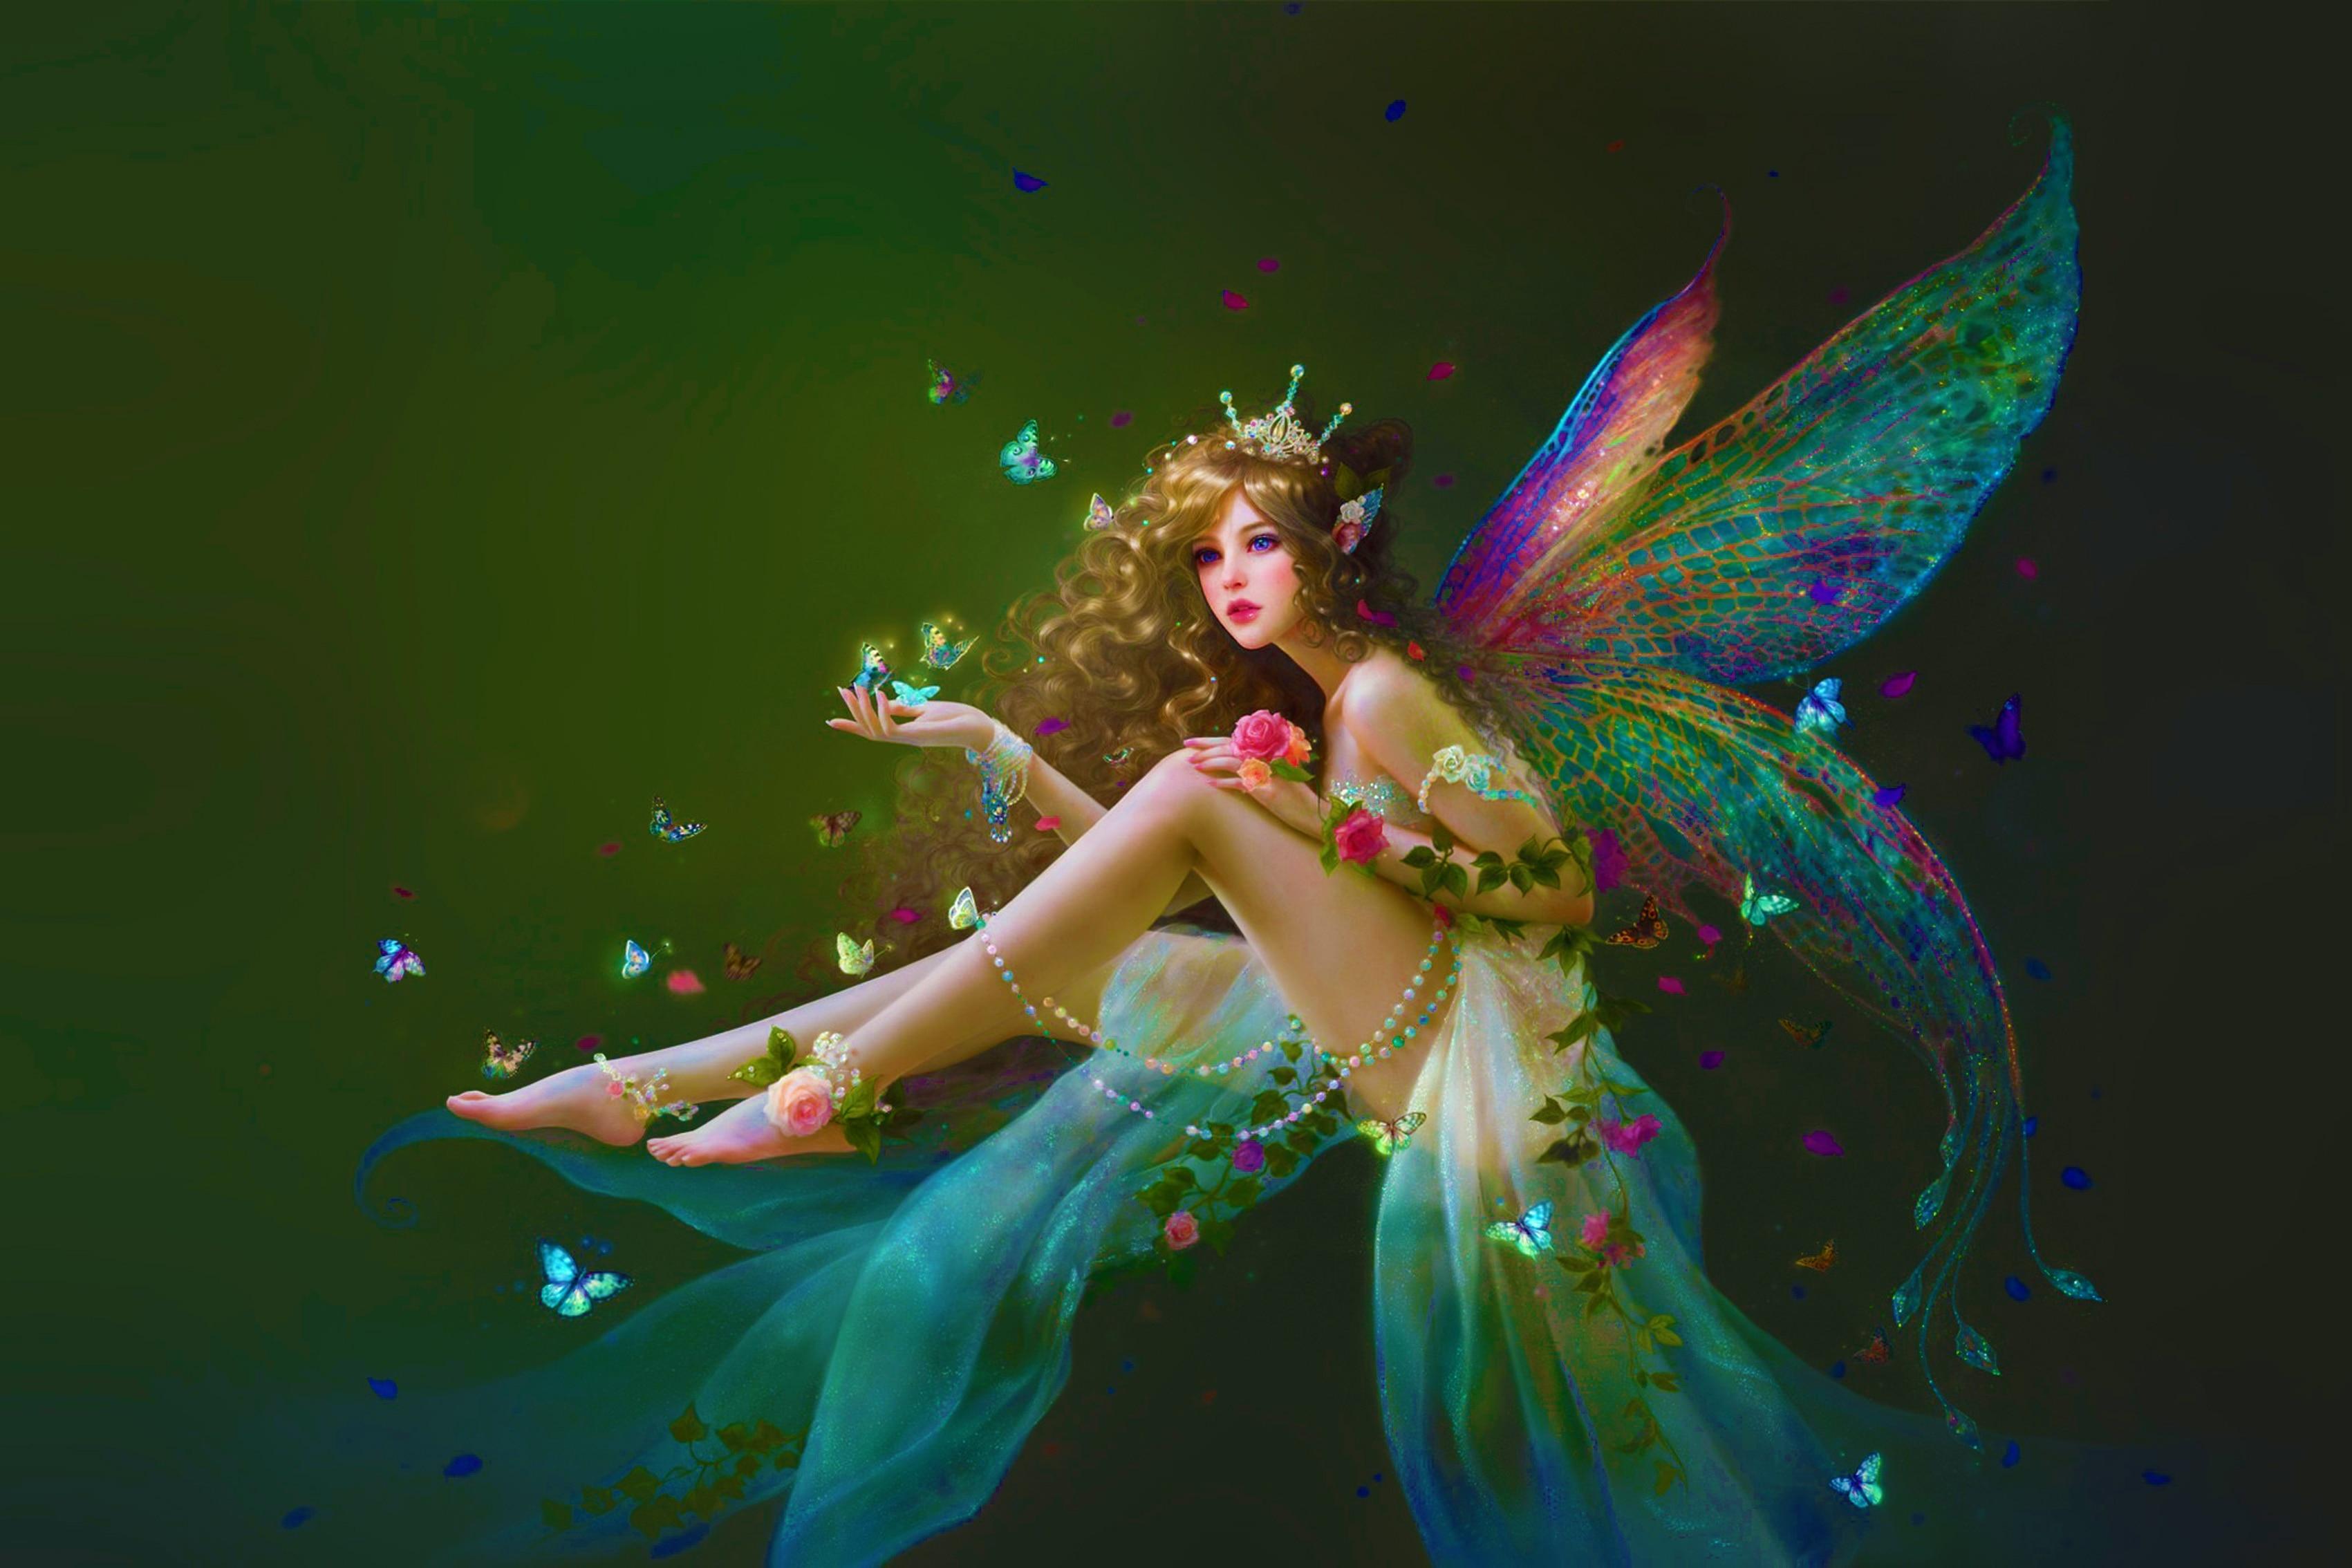 Girl flowers butterfly fairy art fairy fake ruoxin zhang ...